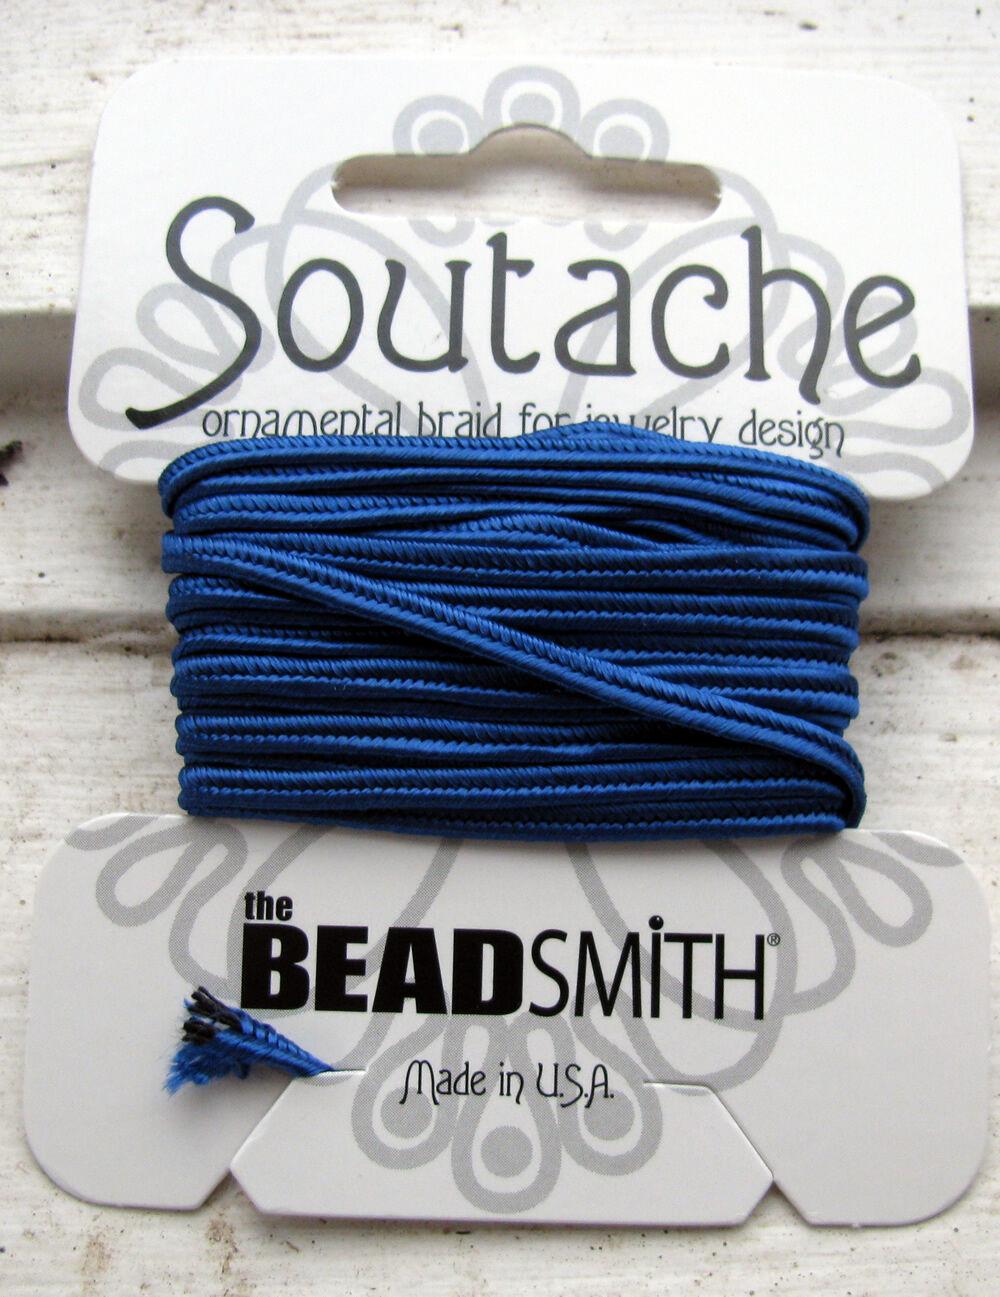 Soutache band - Royal Blue, 1 förpackning (3 yards)